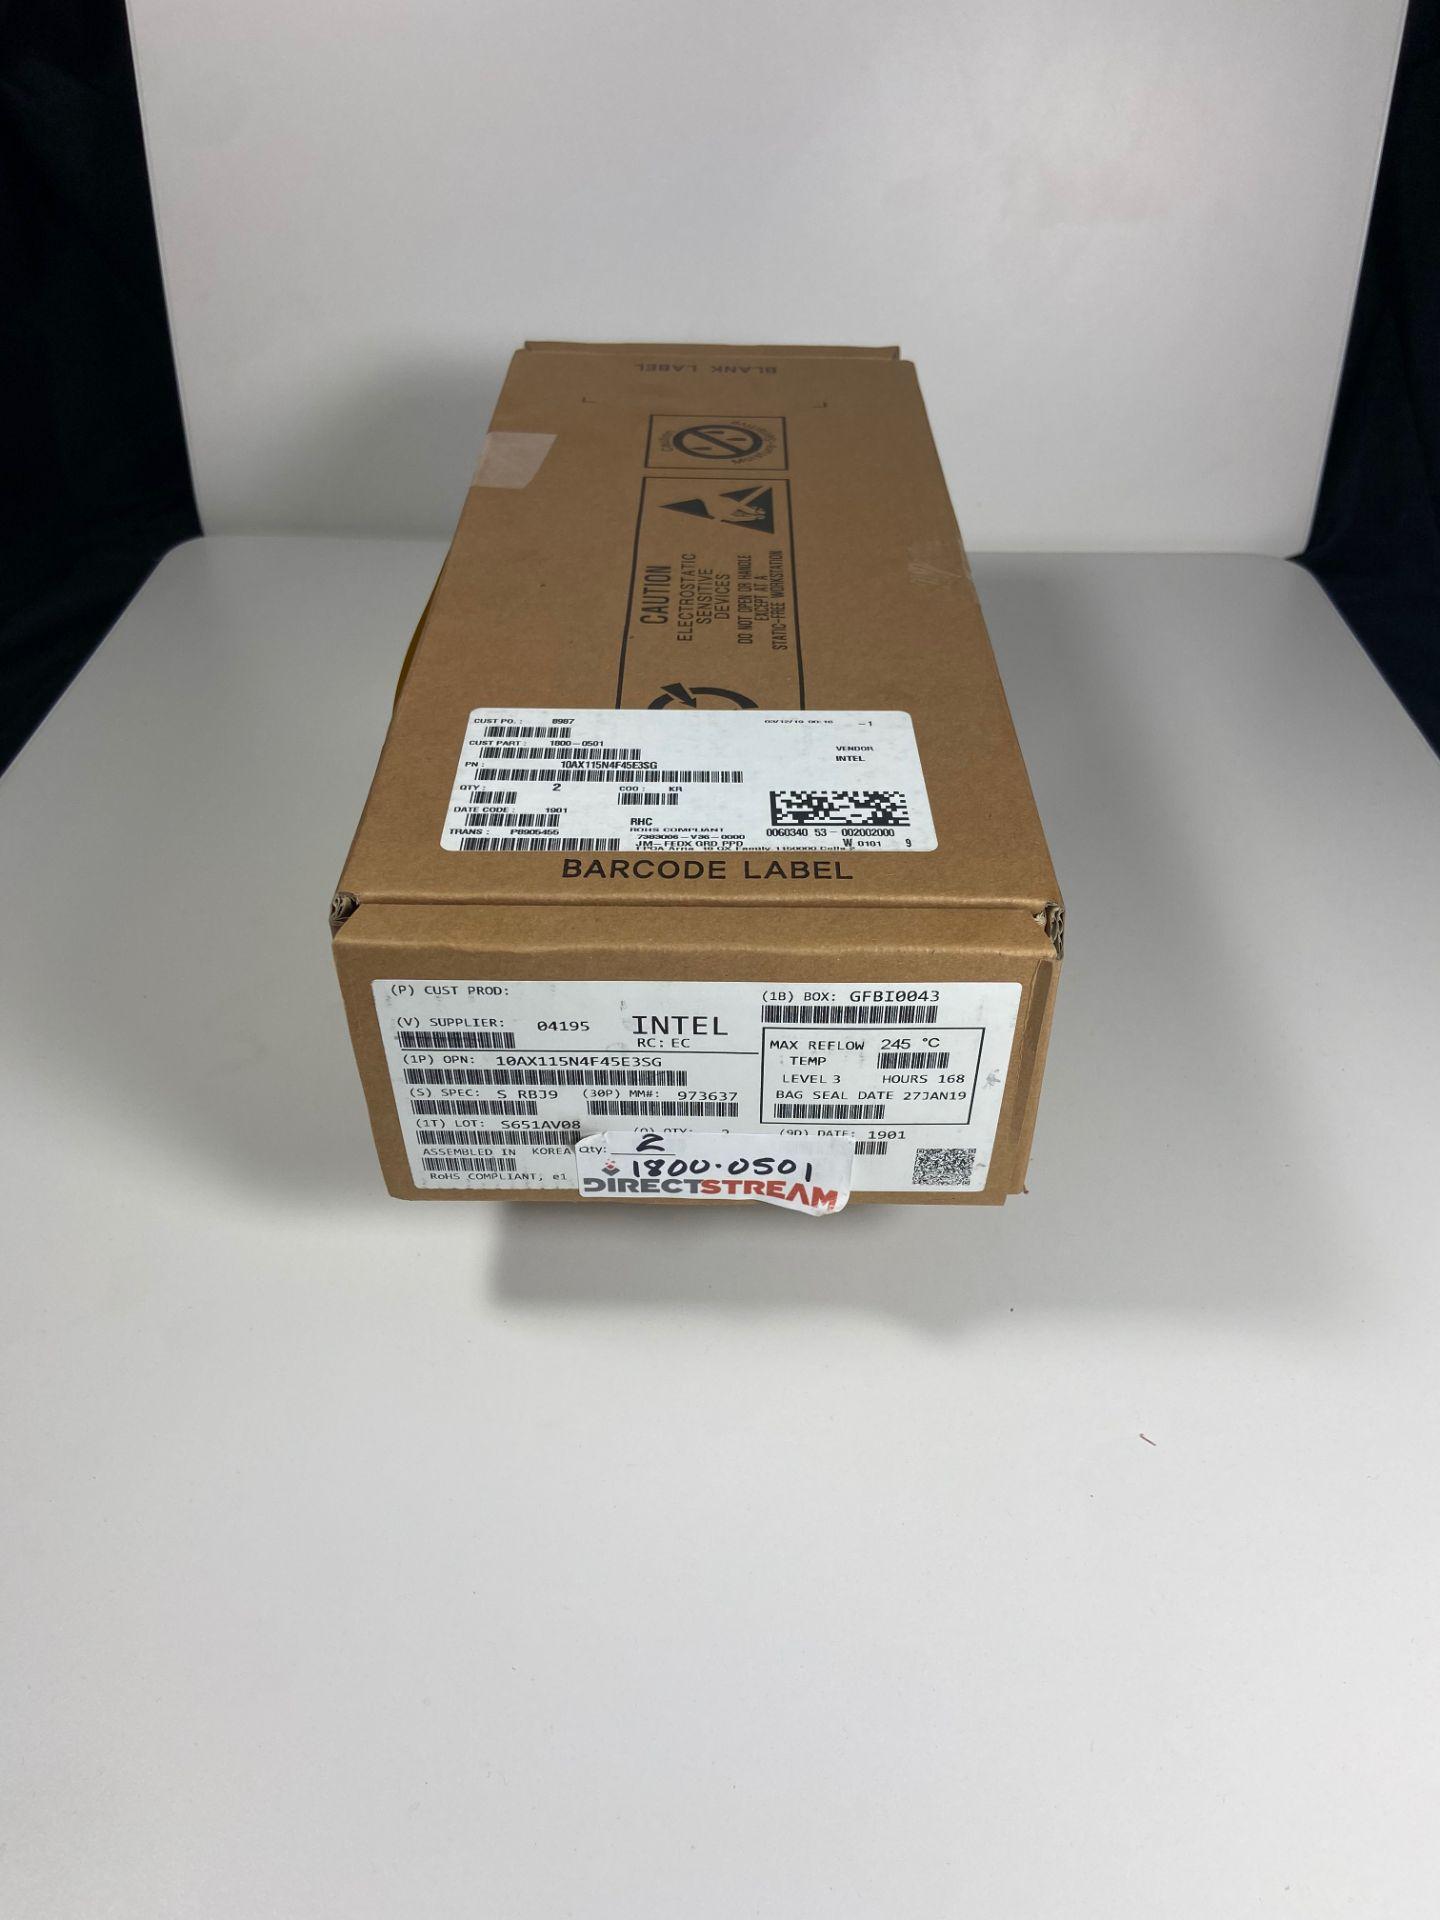 Intel 10AX115N4F45E3SG, QTY 2, FPGA Arria 10 GX Family 1150000 Cells 20nm Technology 0.9V - Image 2 of 6